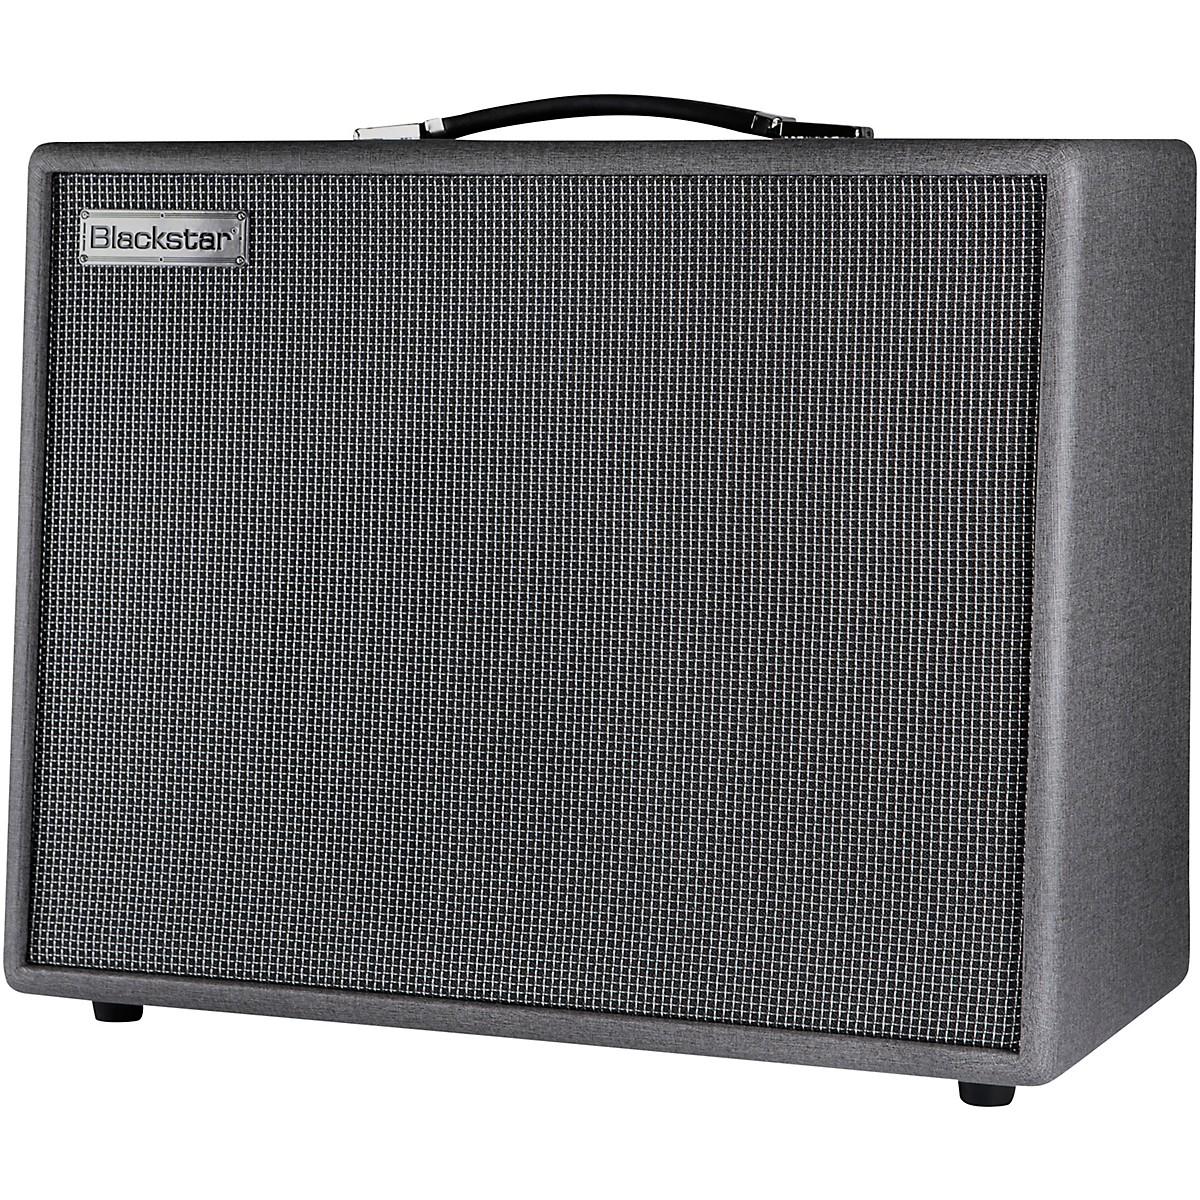 Blackstar Silverline Deluxe 100W Guitar Combo Amp